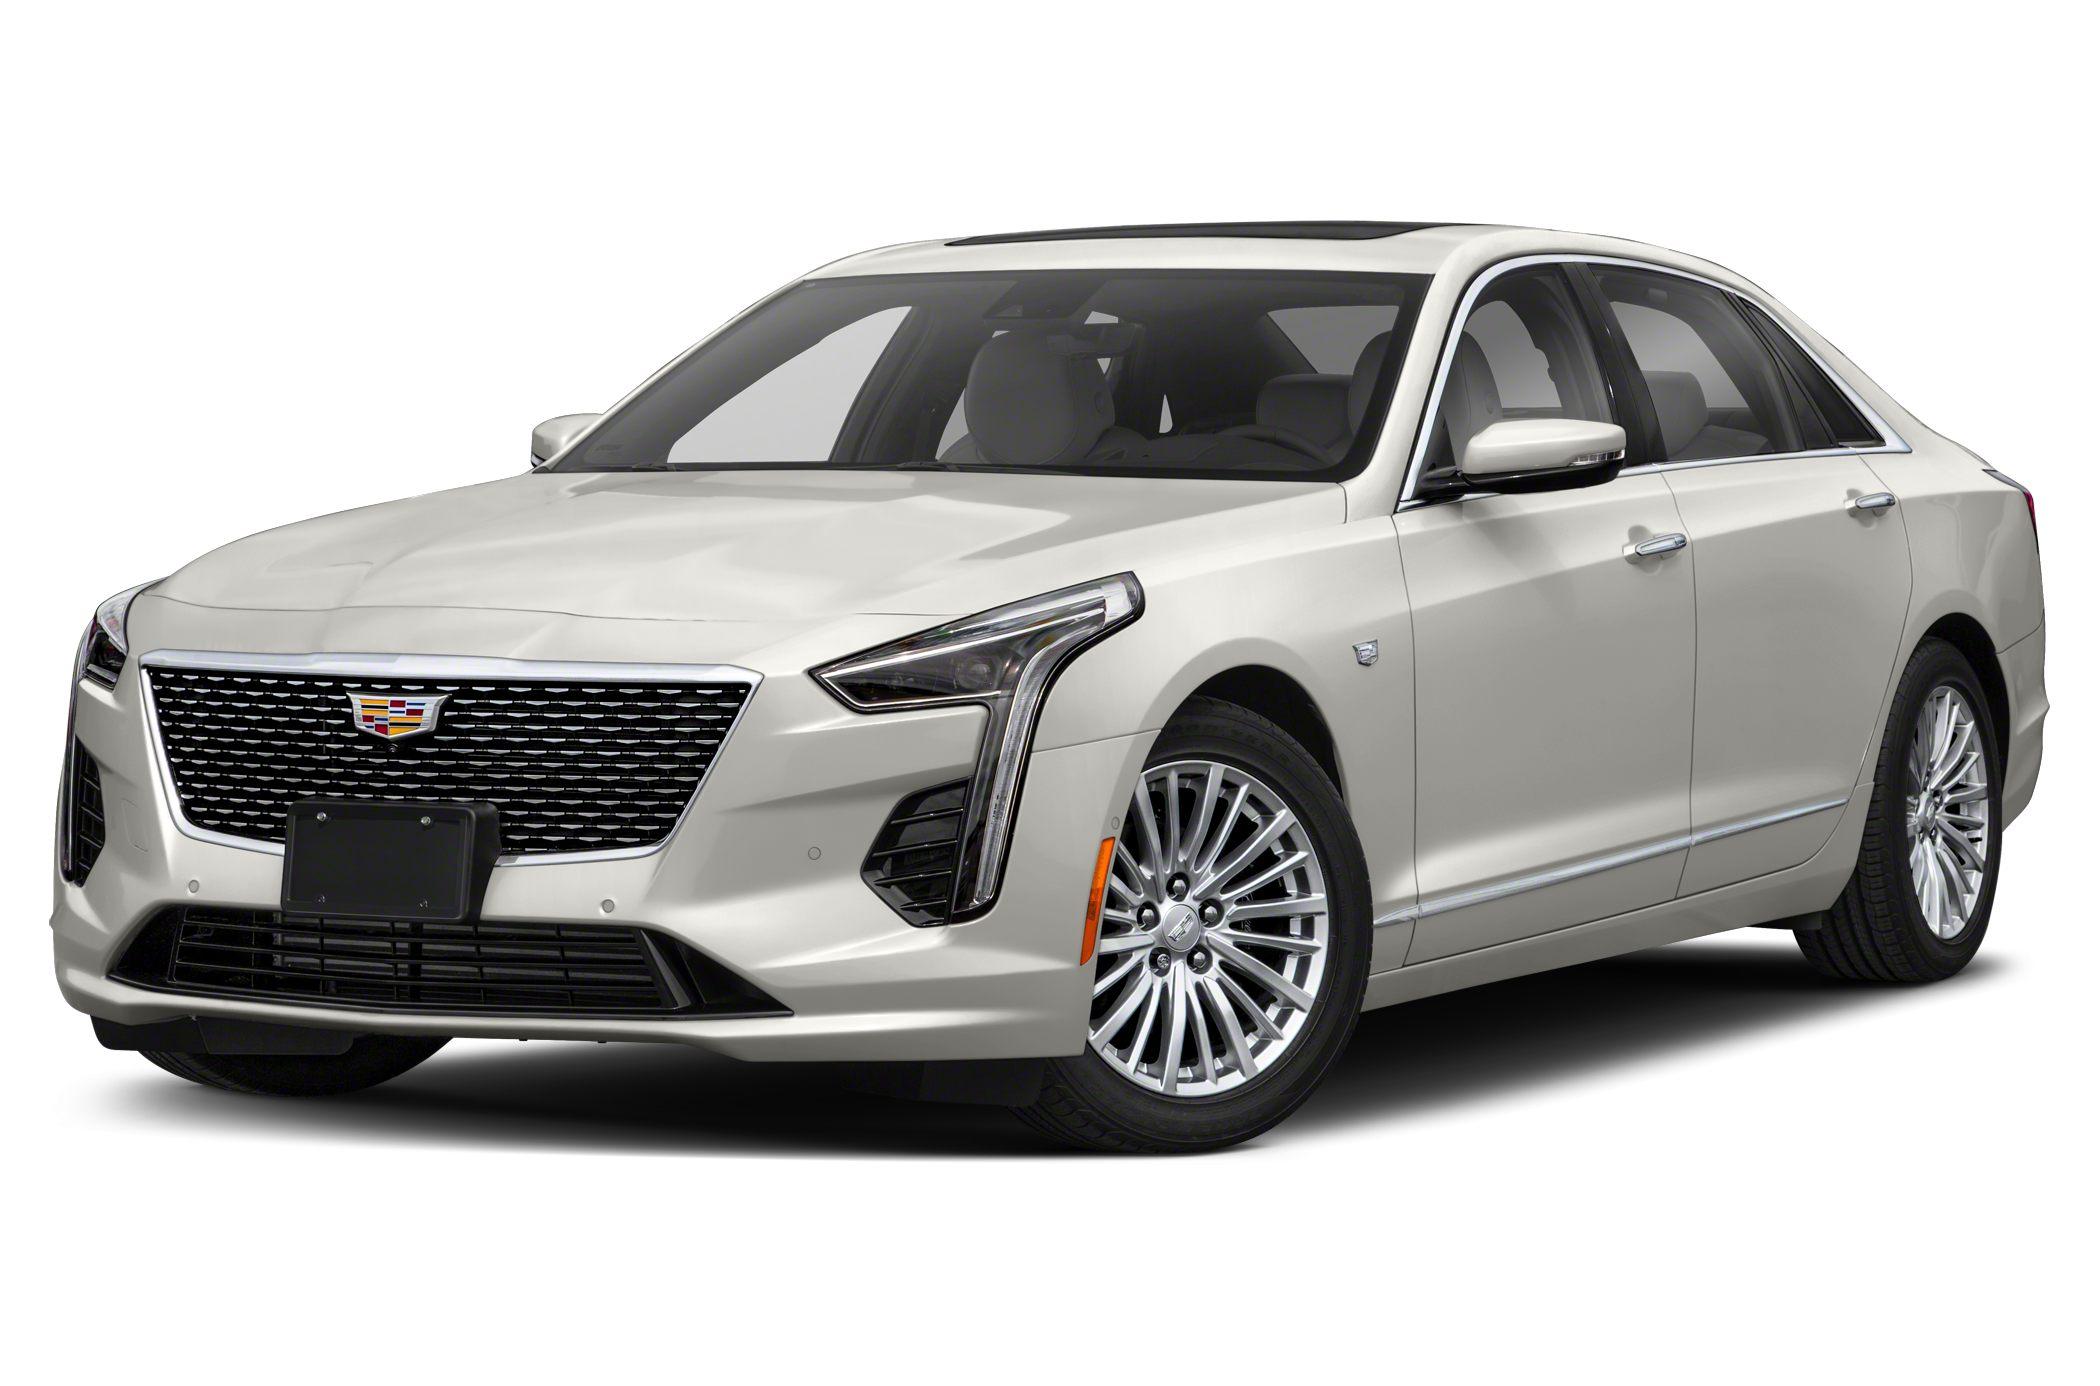 2020 Cadillac CT6 Style